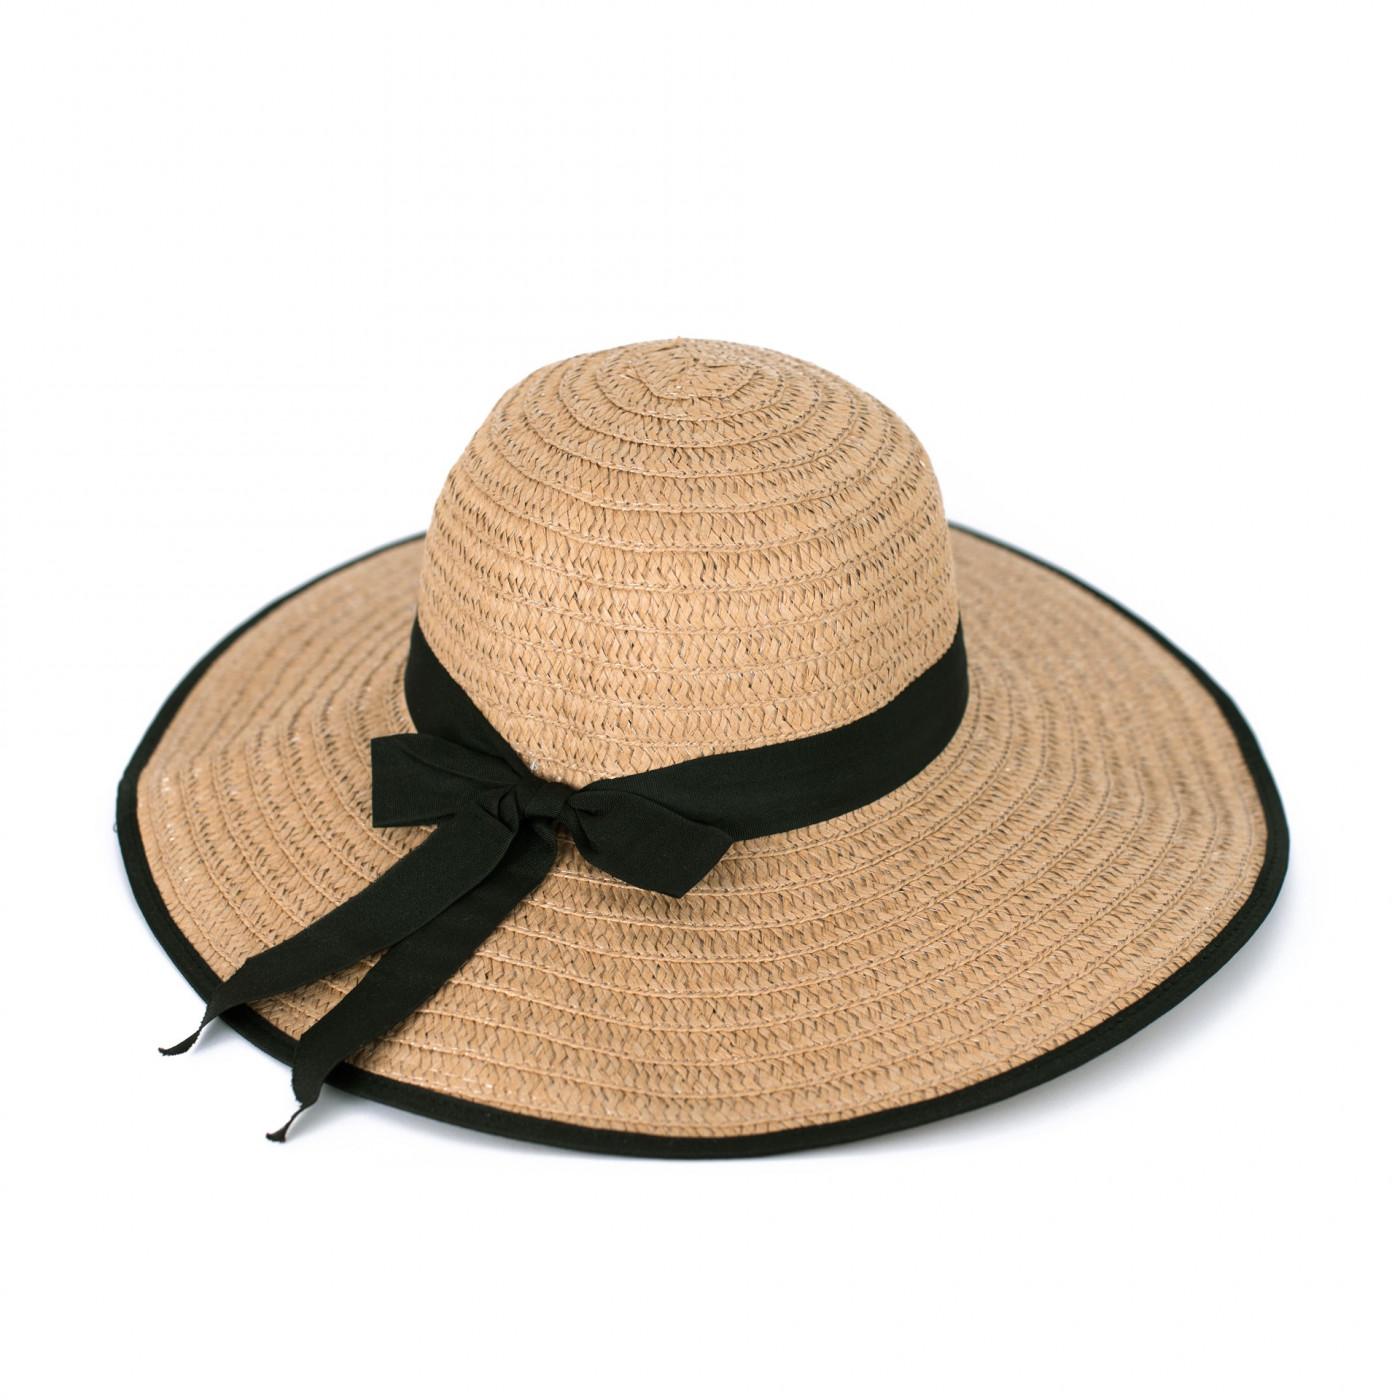 Art Of Polo Woman's Hat cz19186 Dark